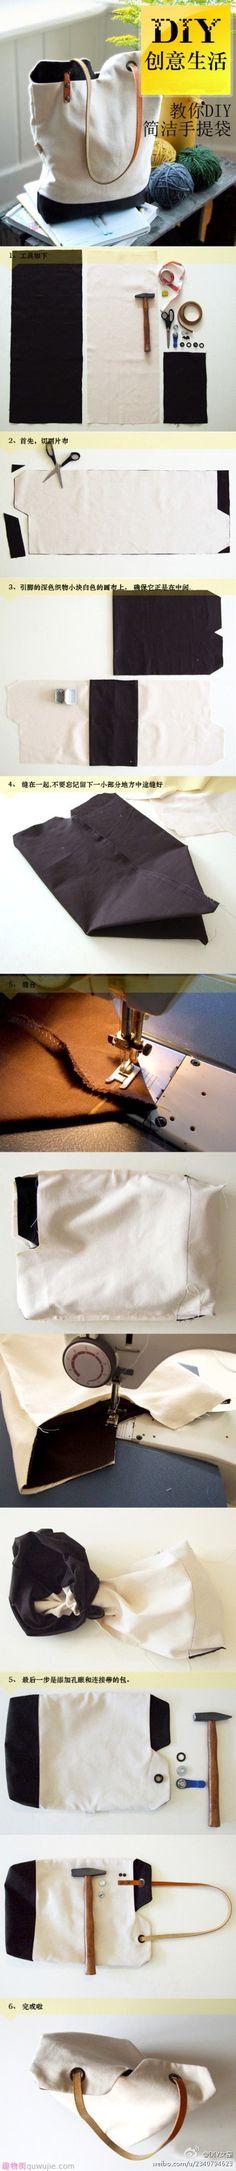 ok sewing machines, craft, purs, diy bags, diy canvas, bag tutorials, tote bags, diy projects, sewing tutorials